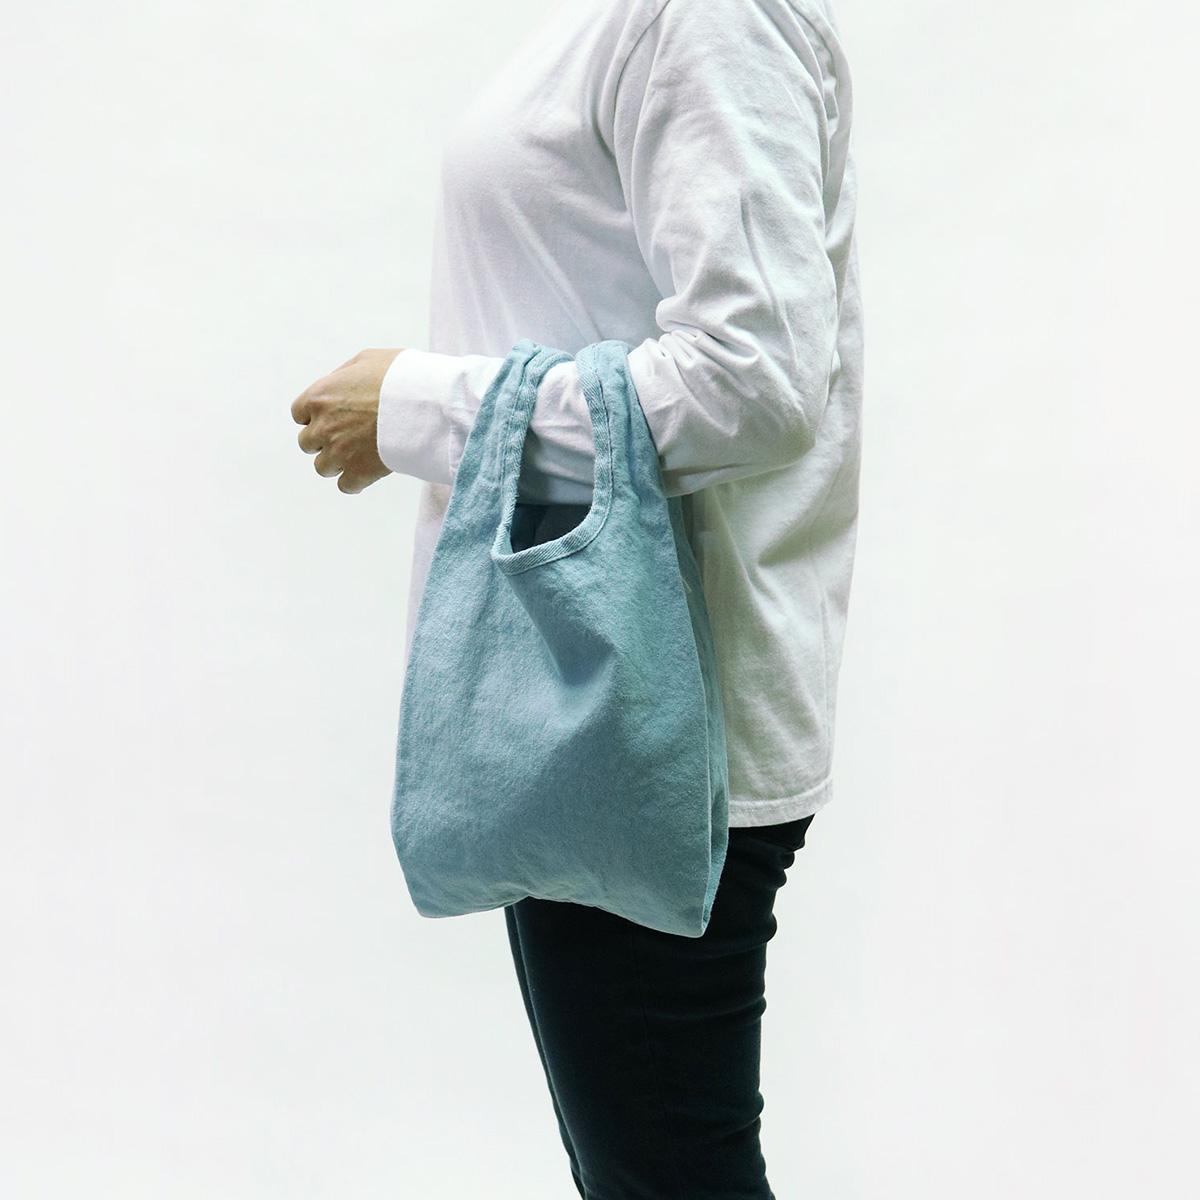 【MAKEUP】倉敷帆布 製品染め エコバッグ S 8カラー